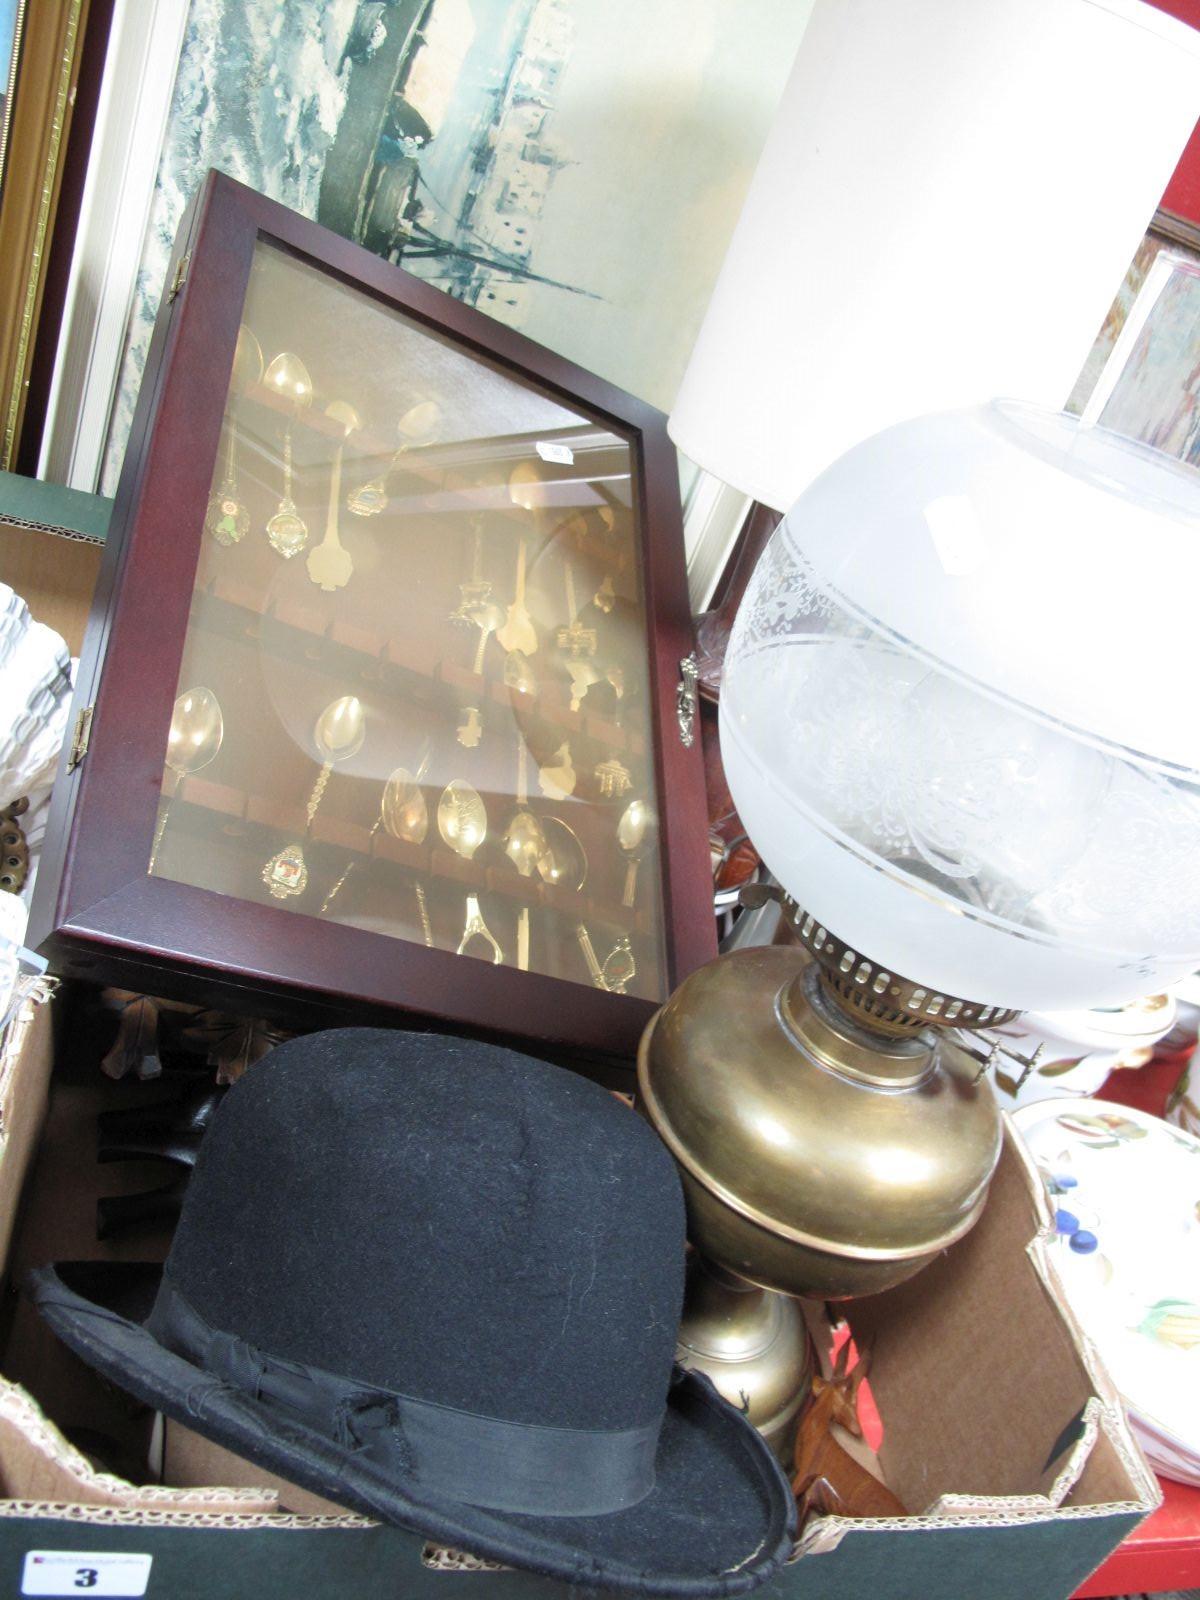 Lot 3 - An Early XX Century Parafin Lamp, an Atlas Brand bowler hat, carved wooden cuckoo clock, metamec